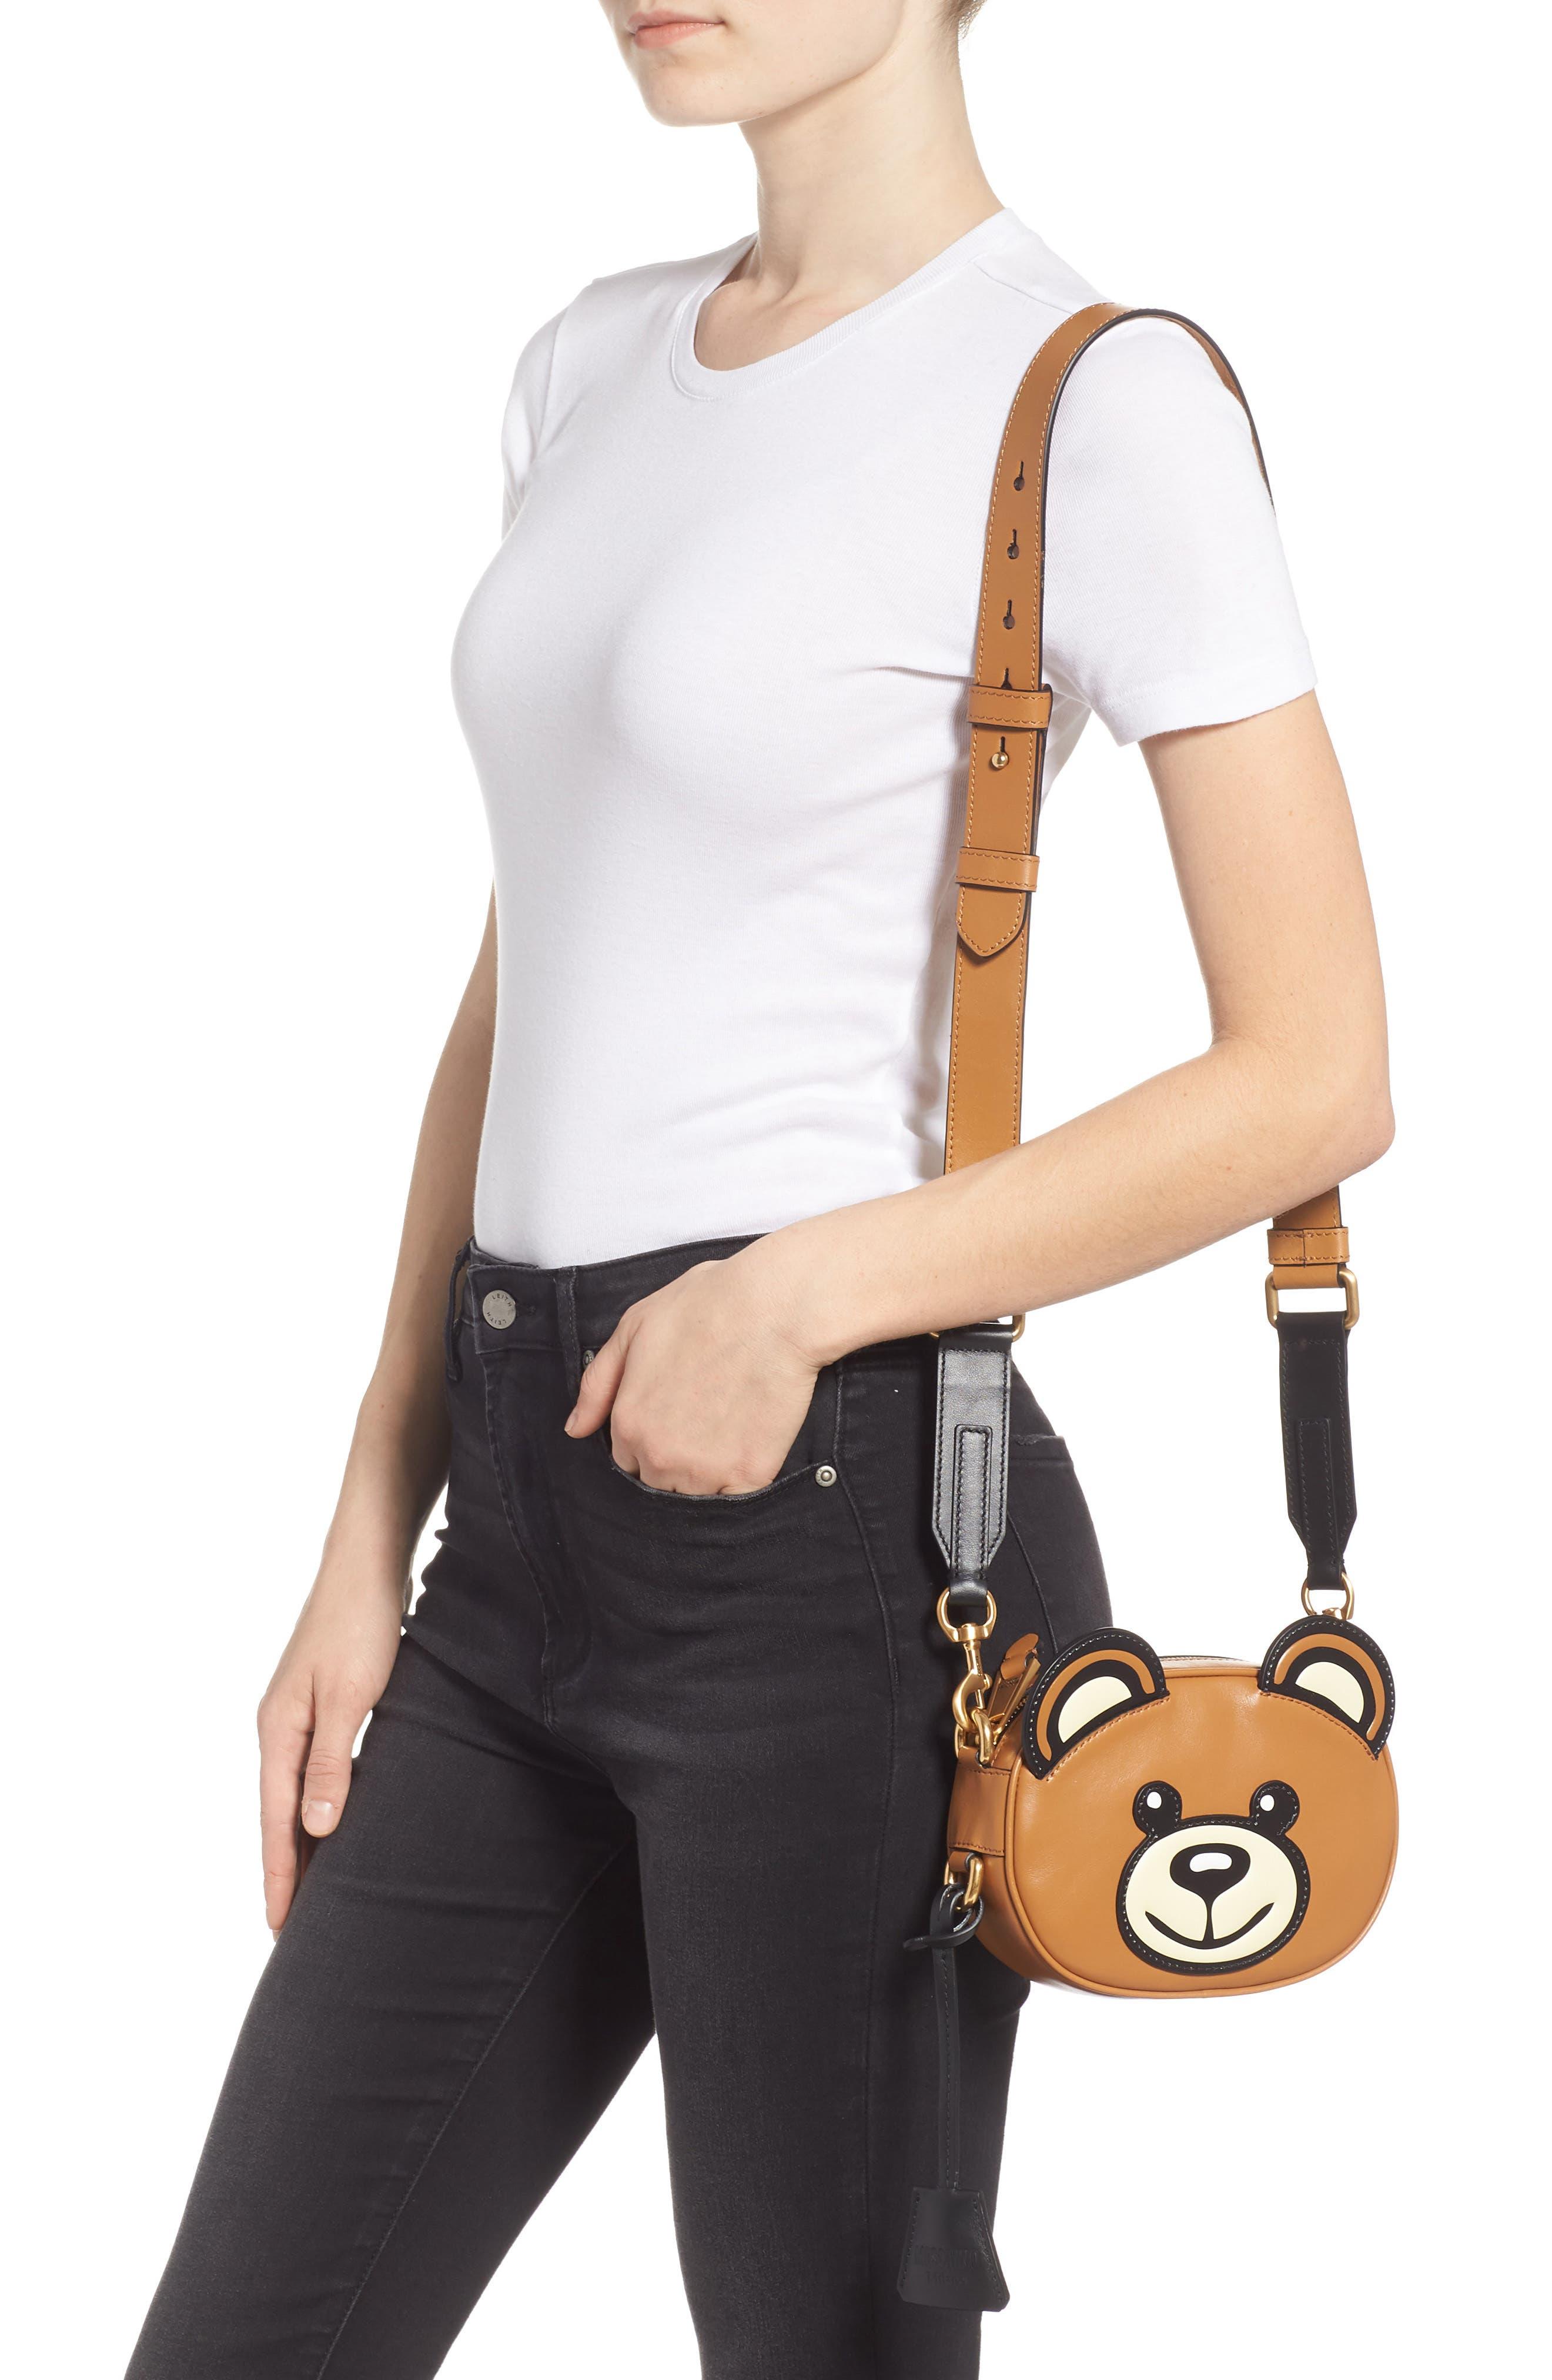 Crystal Teddy Leather Crossbody Bag,                             Alternate thumbnail 2, color,                             BROWN